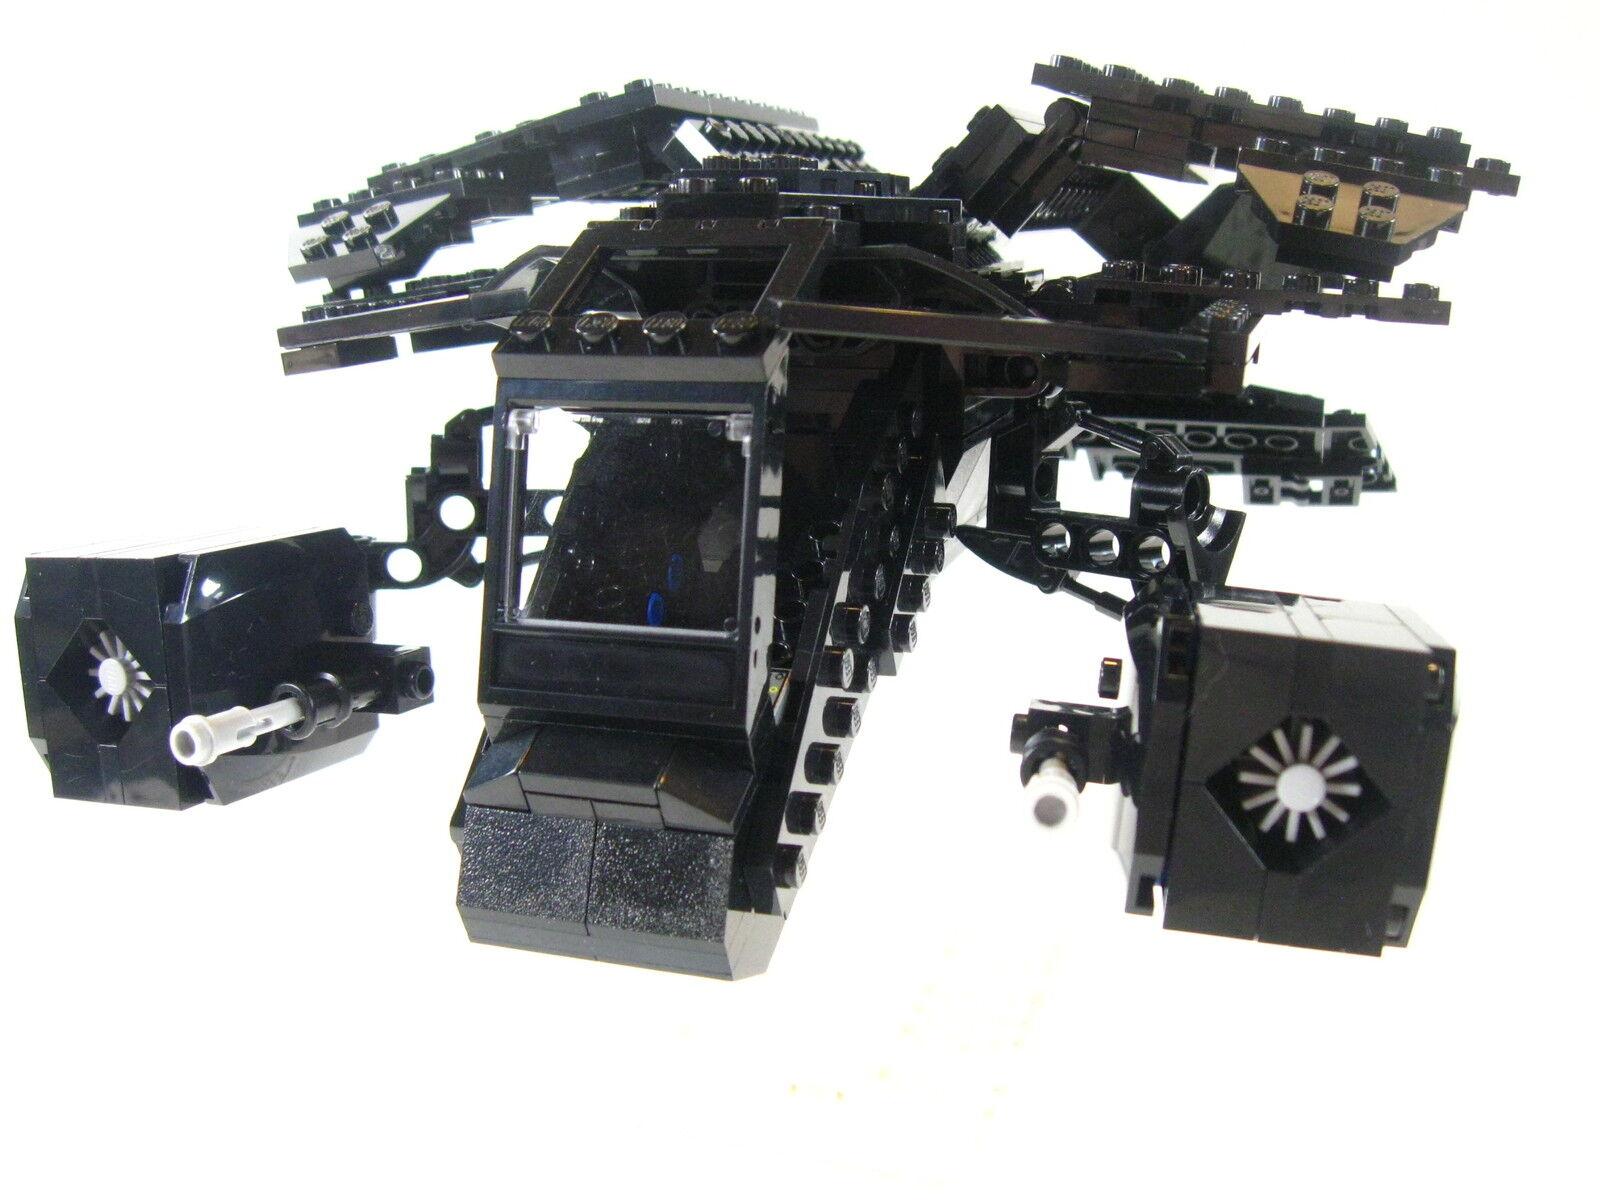 lego dark knight rises sets - photo #36